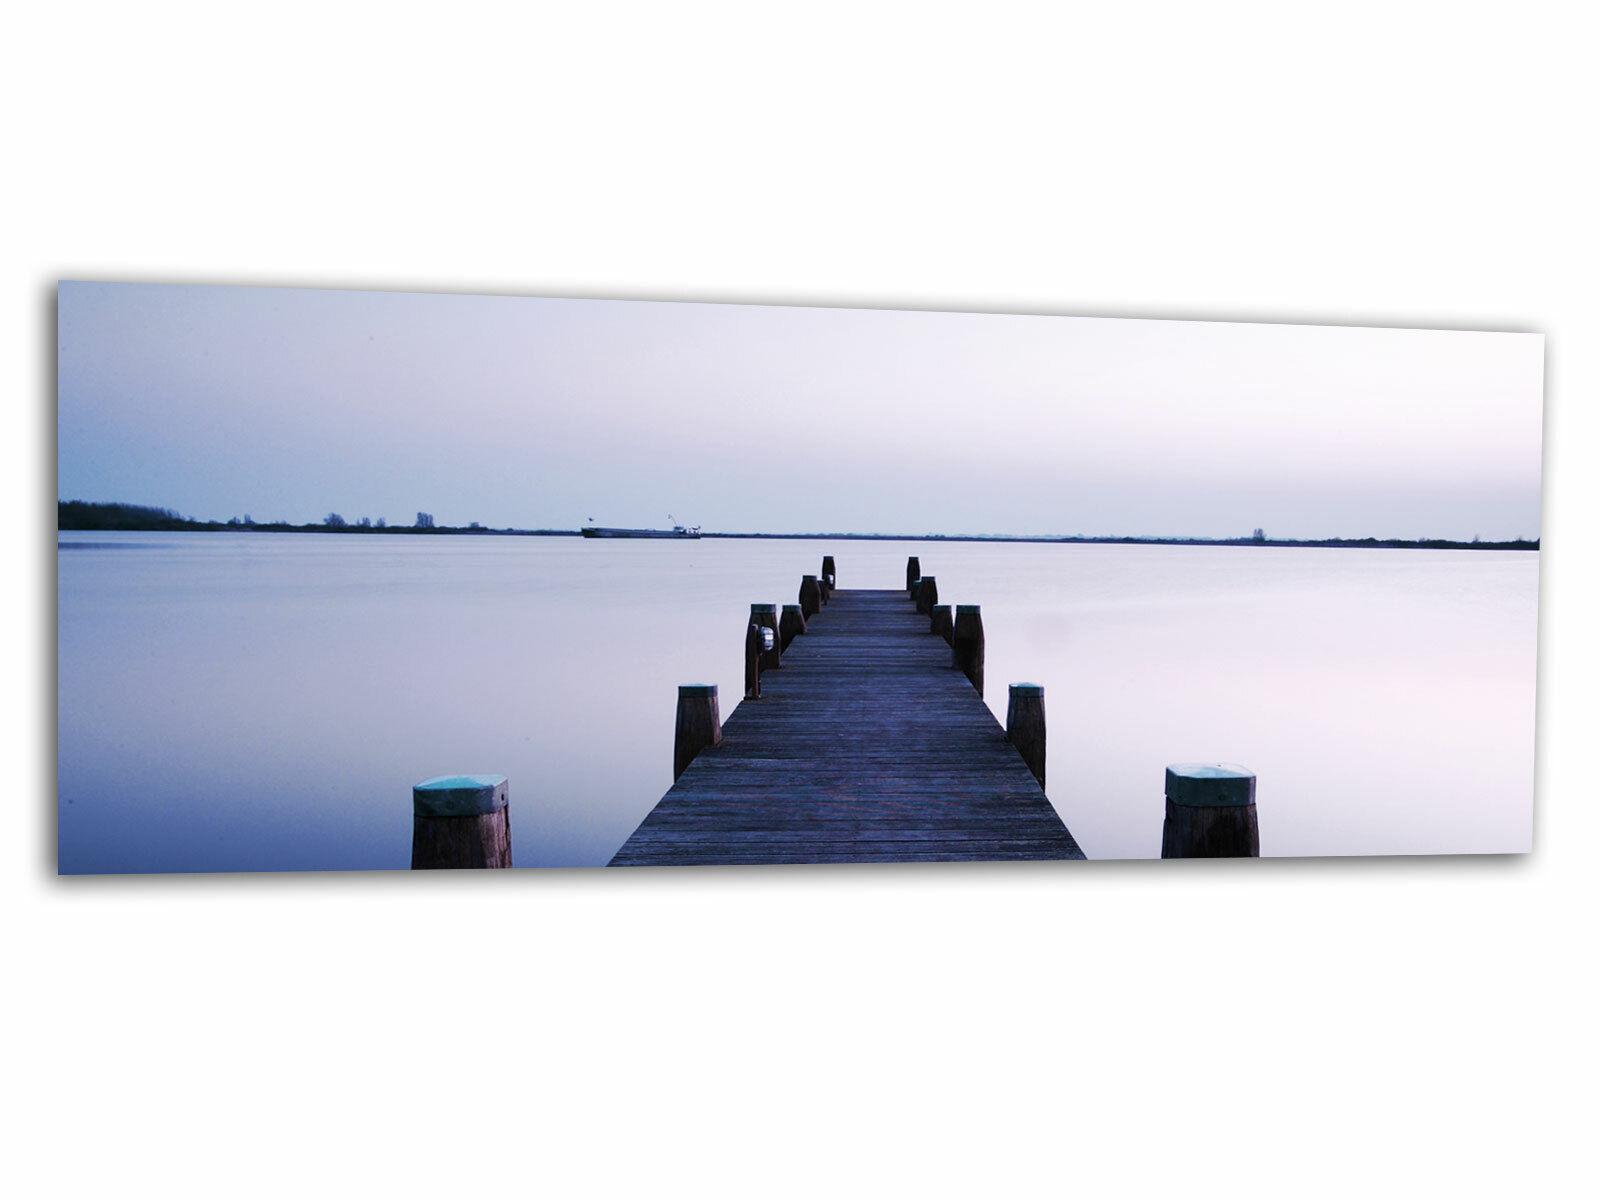 Glas-Bild Wandbild STEG ROMANTIC Blau I AG-01123 125 x 50cm